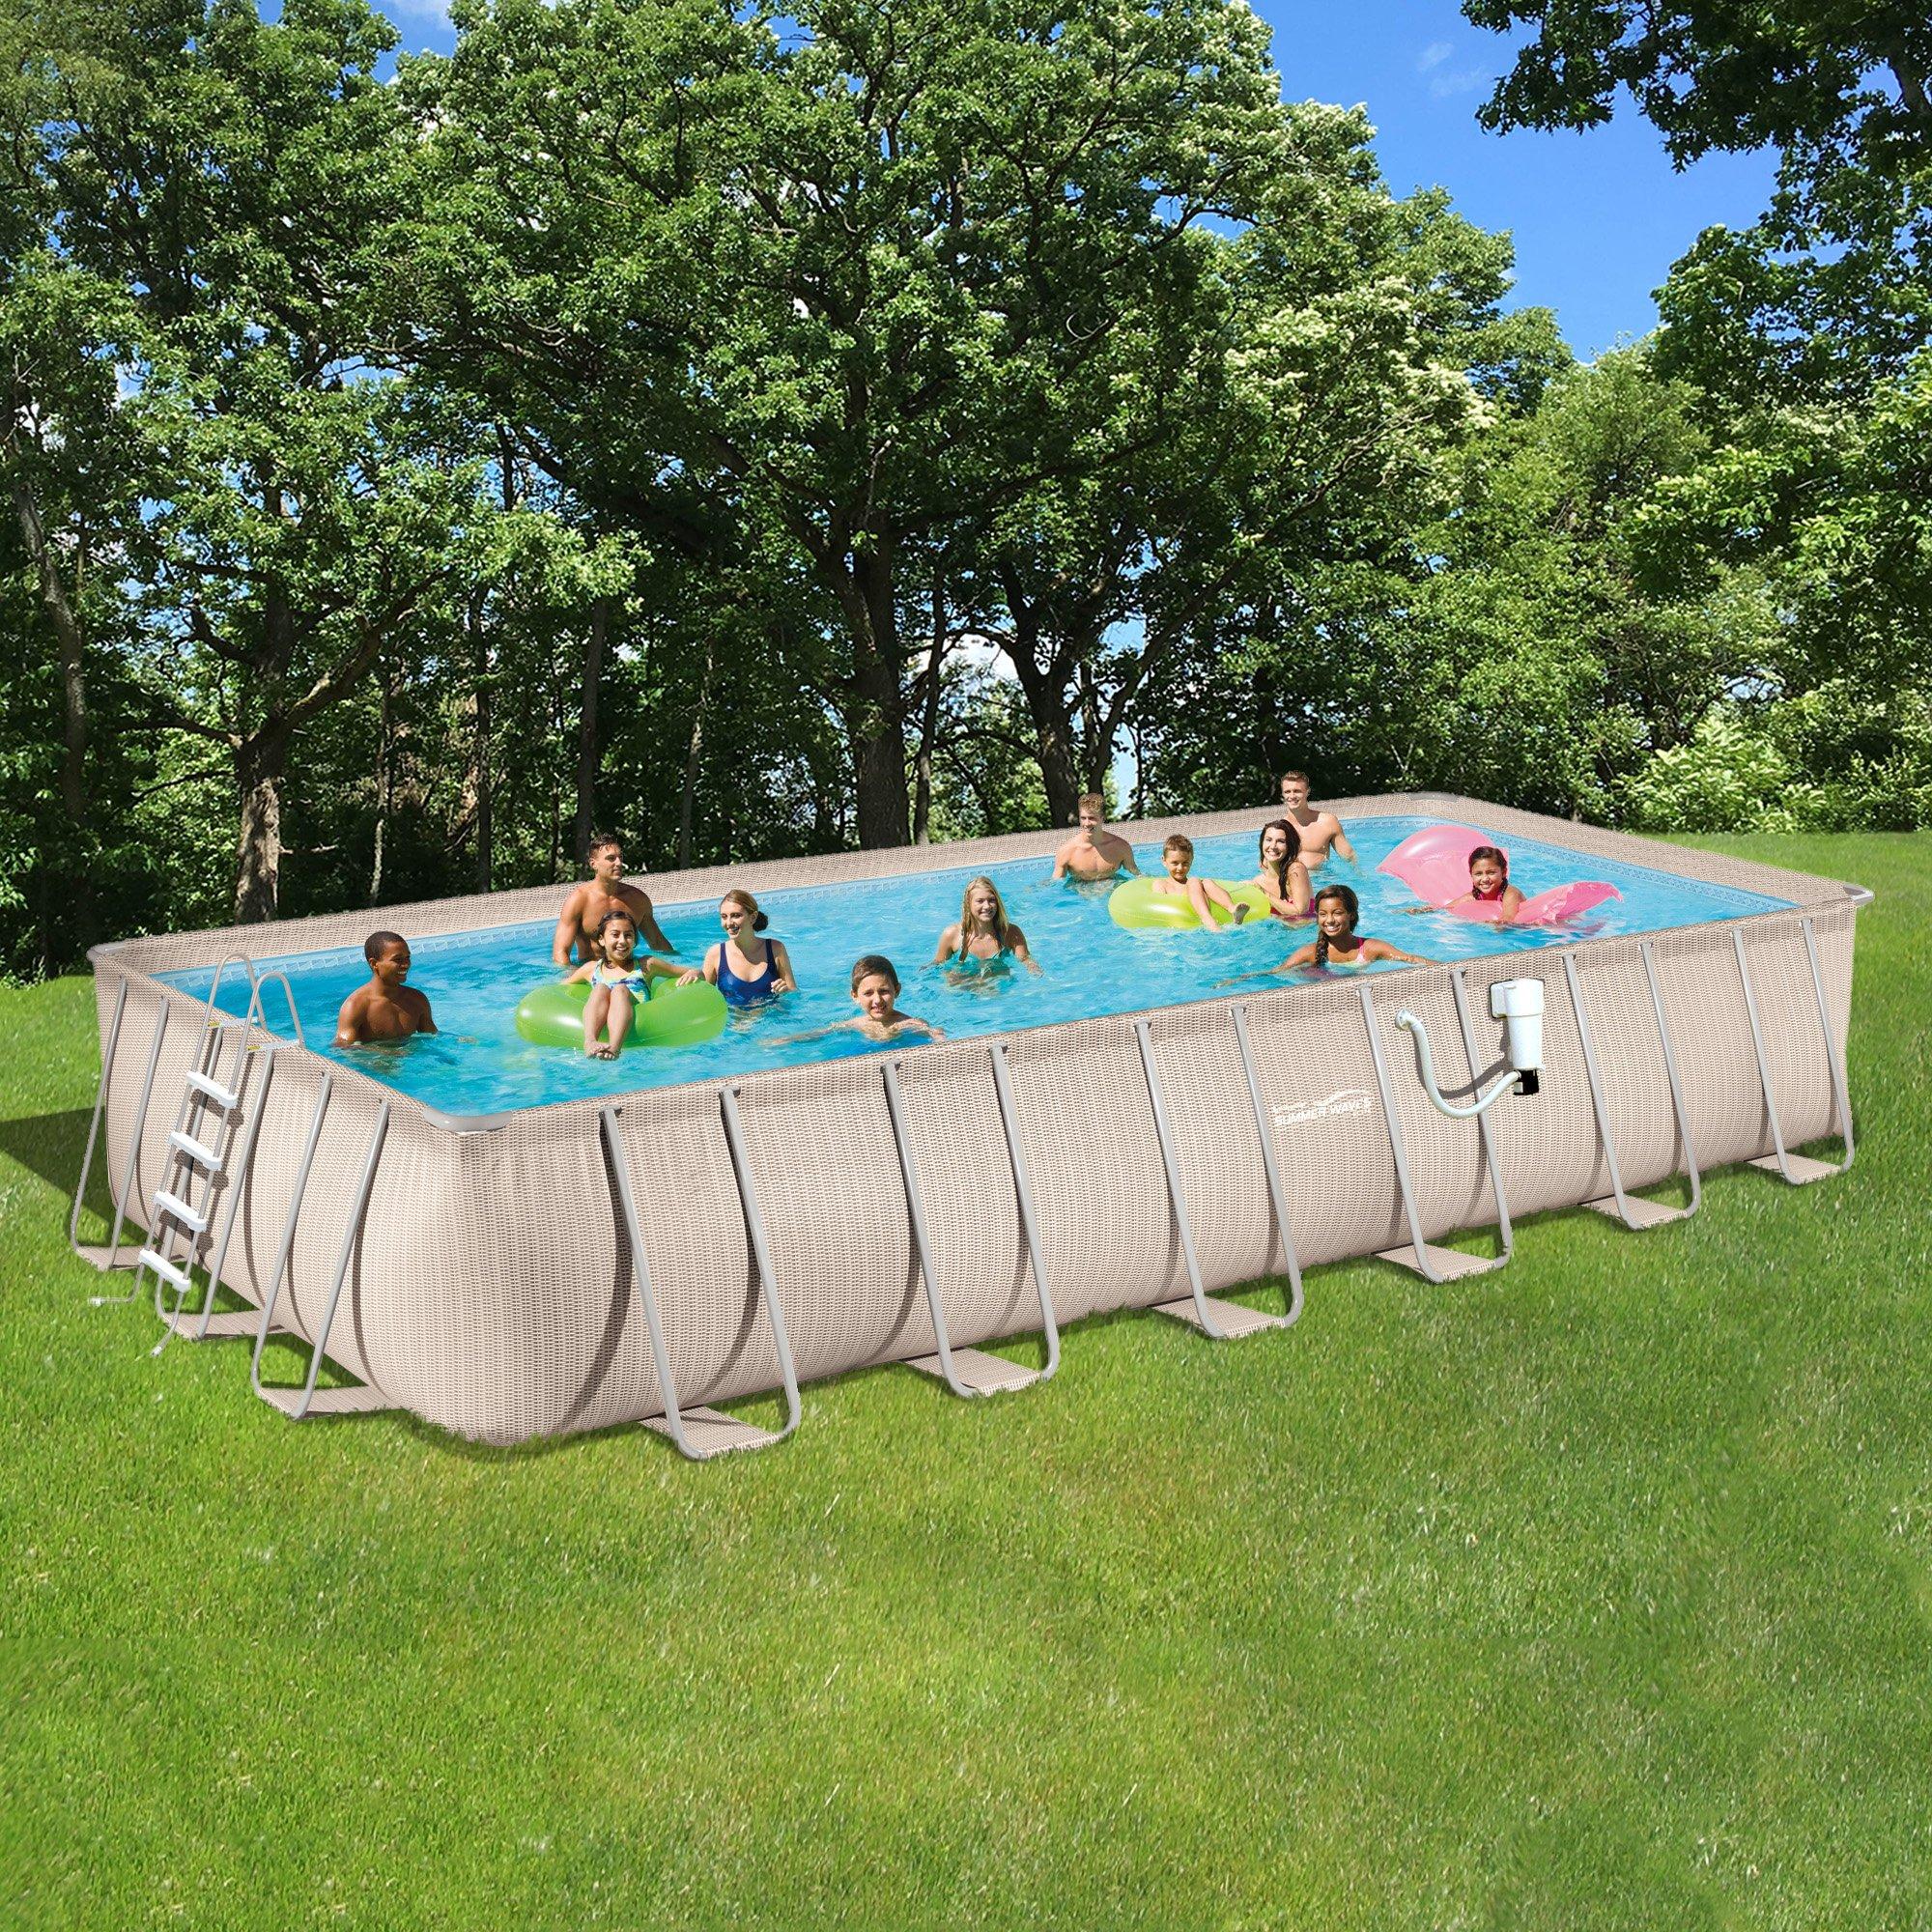 Pool Package Light Wicker 12'x24' Rect Metal Frame 52'' Deep Summer Waves NB2234